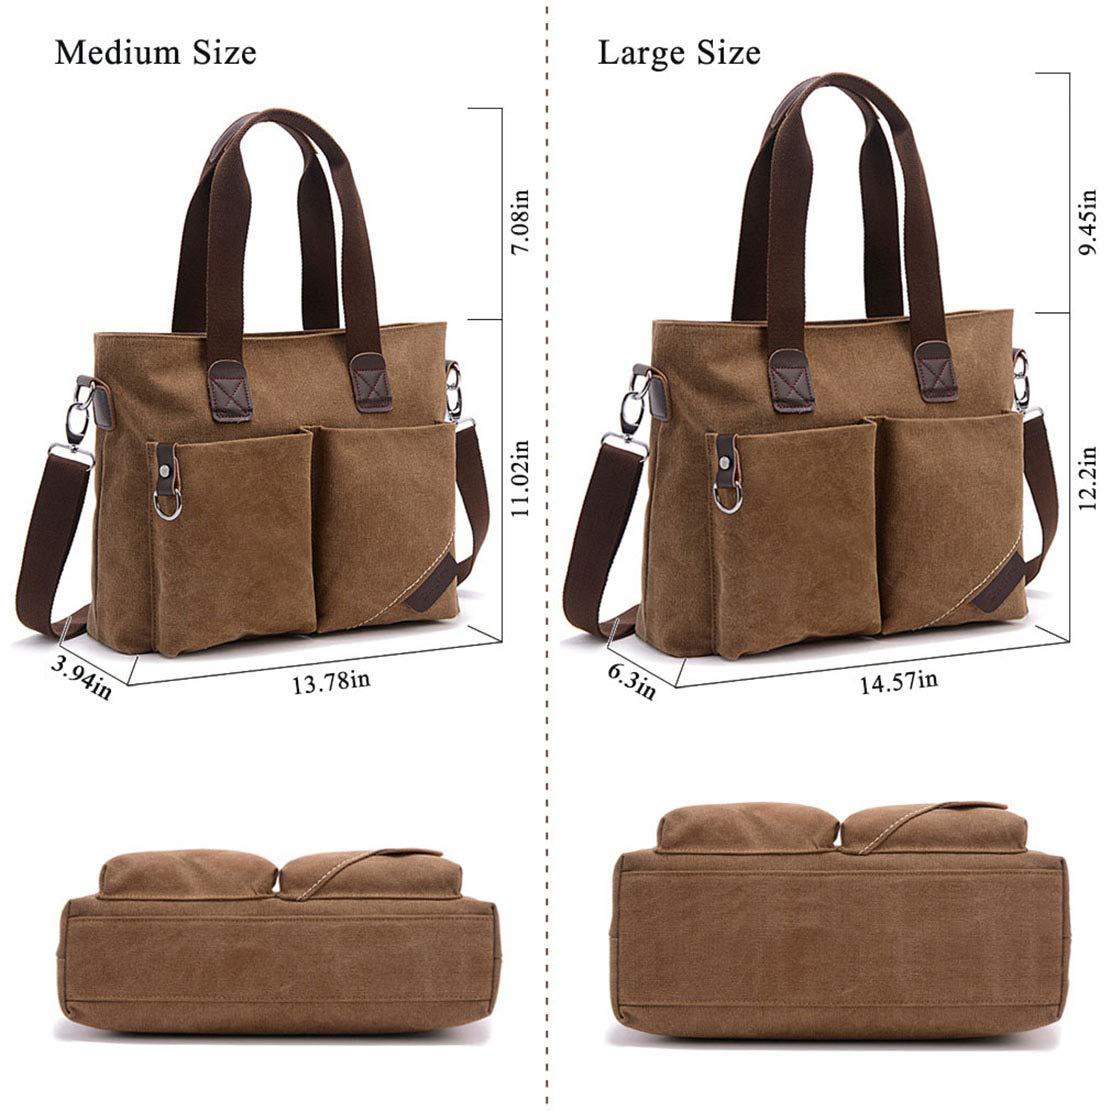 ToLFE Women Top Handle Satchel Handbags Tote Purse Shoulder Bag (Khaki-(Large)) by ToLFE (Image #5)